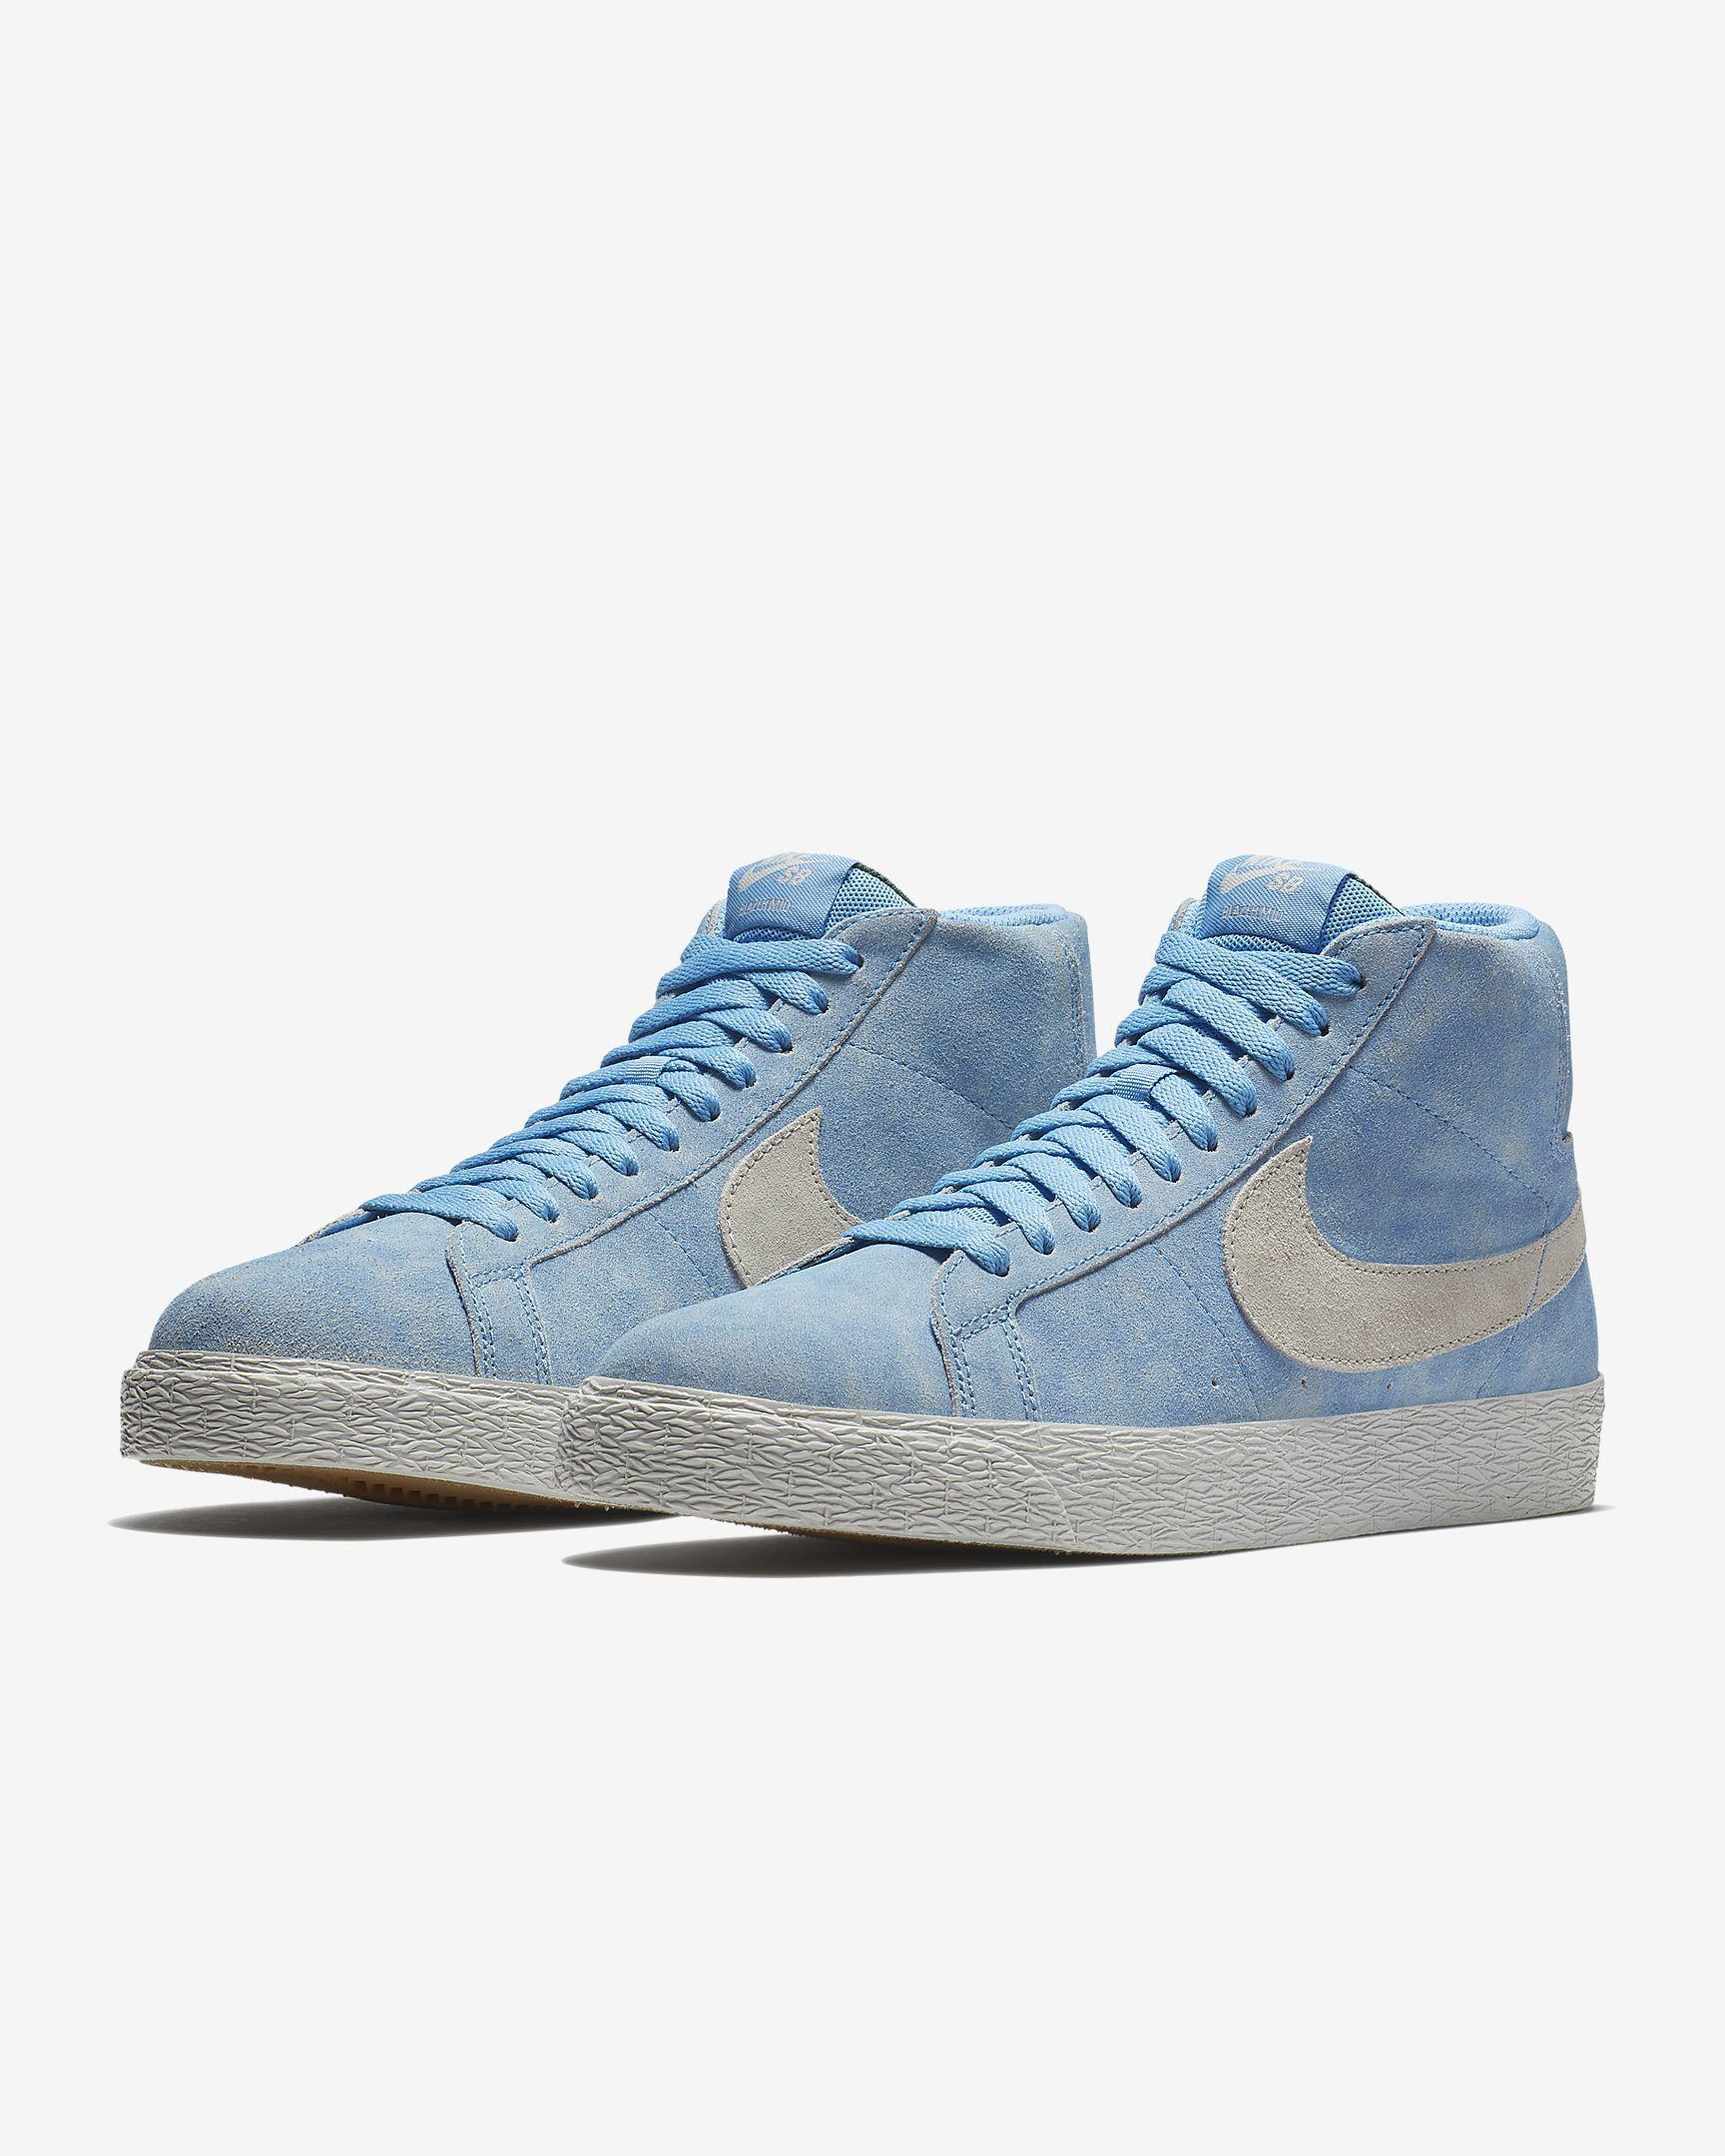 Nike SB Blazer Mid Men's Skateboarding Shoe   Sneakers men